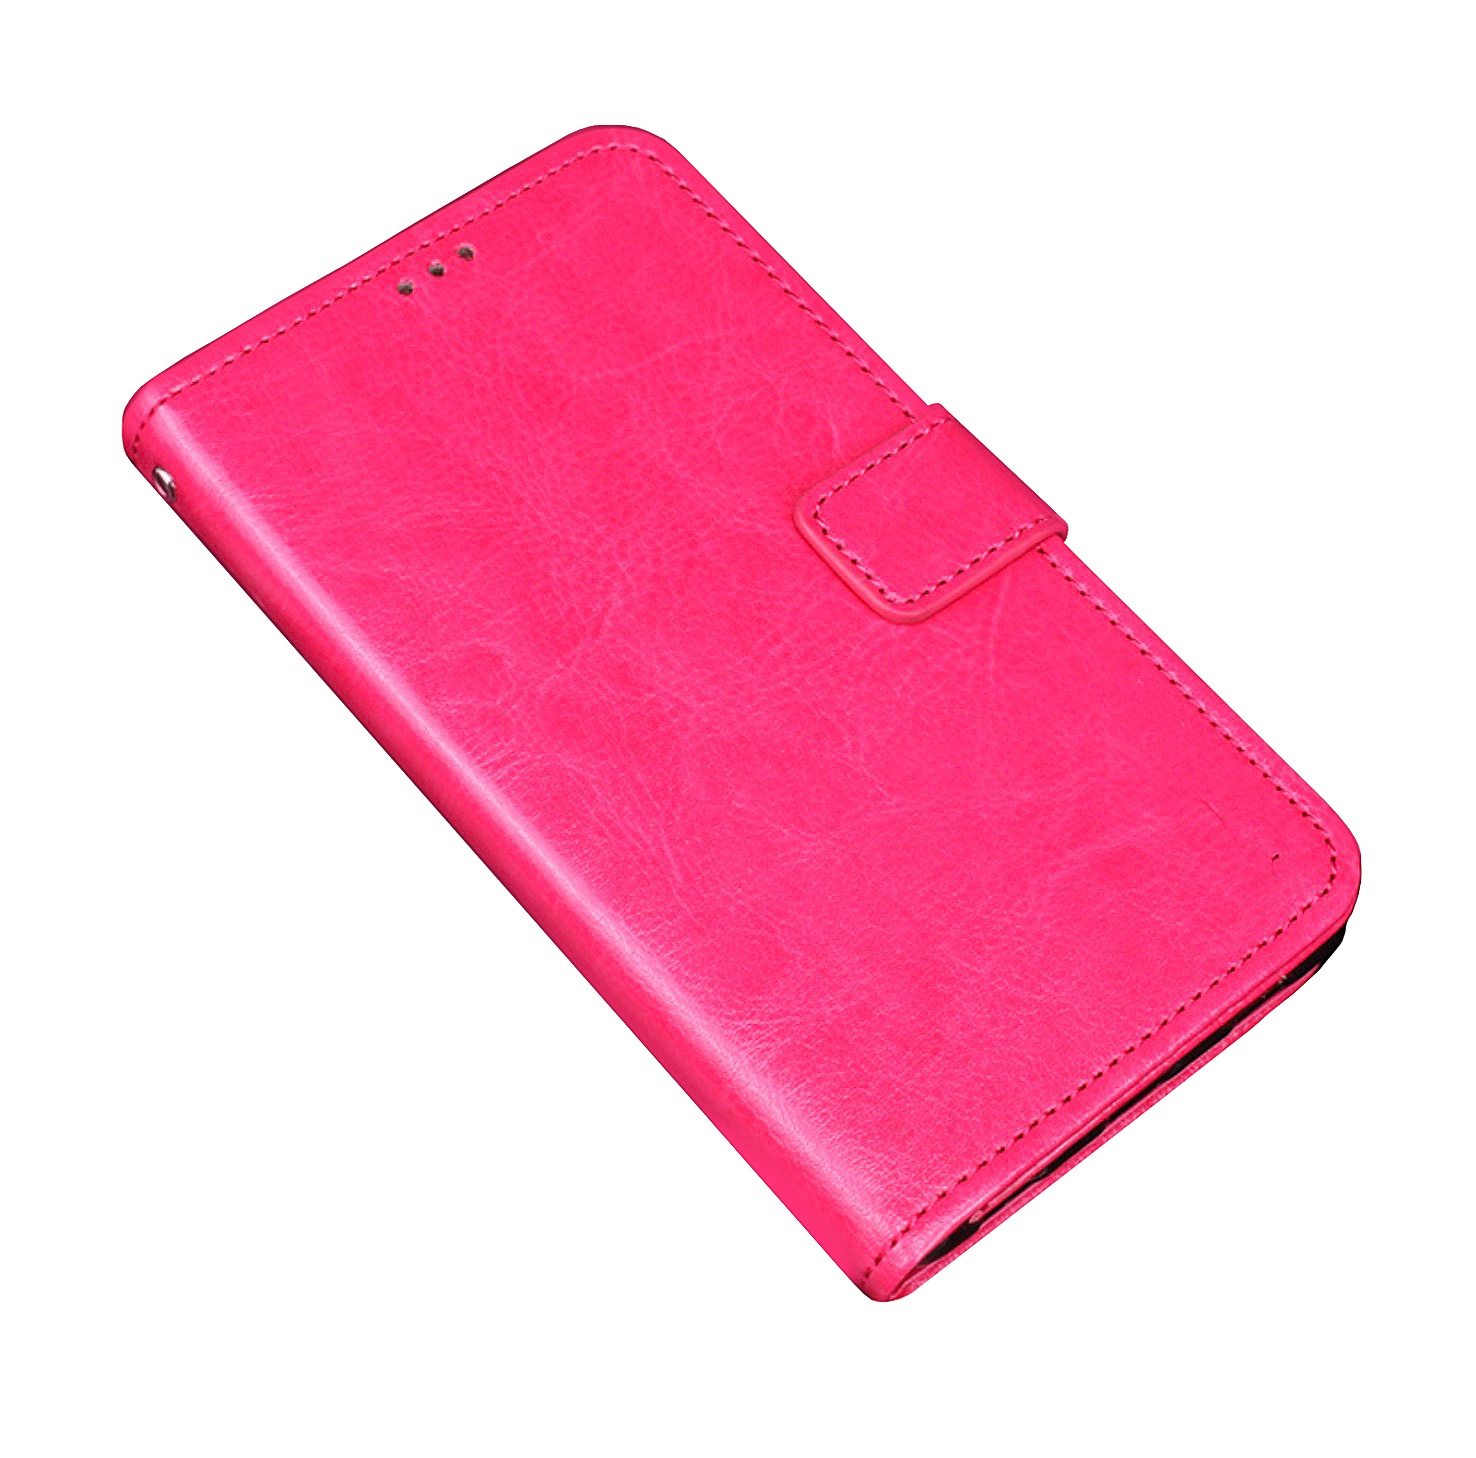 Чехол-книжка MyPads для Sony Xperia L1 / L1 Dual 5.5 (G3312) с мульти-подставкой застёжкой и визитницей розовый смартфон sony g3312 xperia l1 dual black